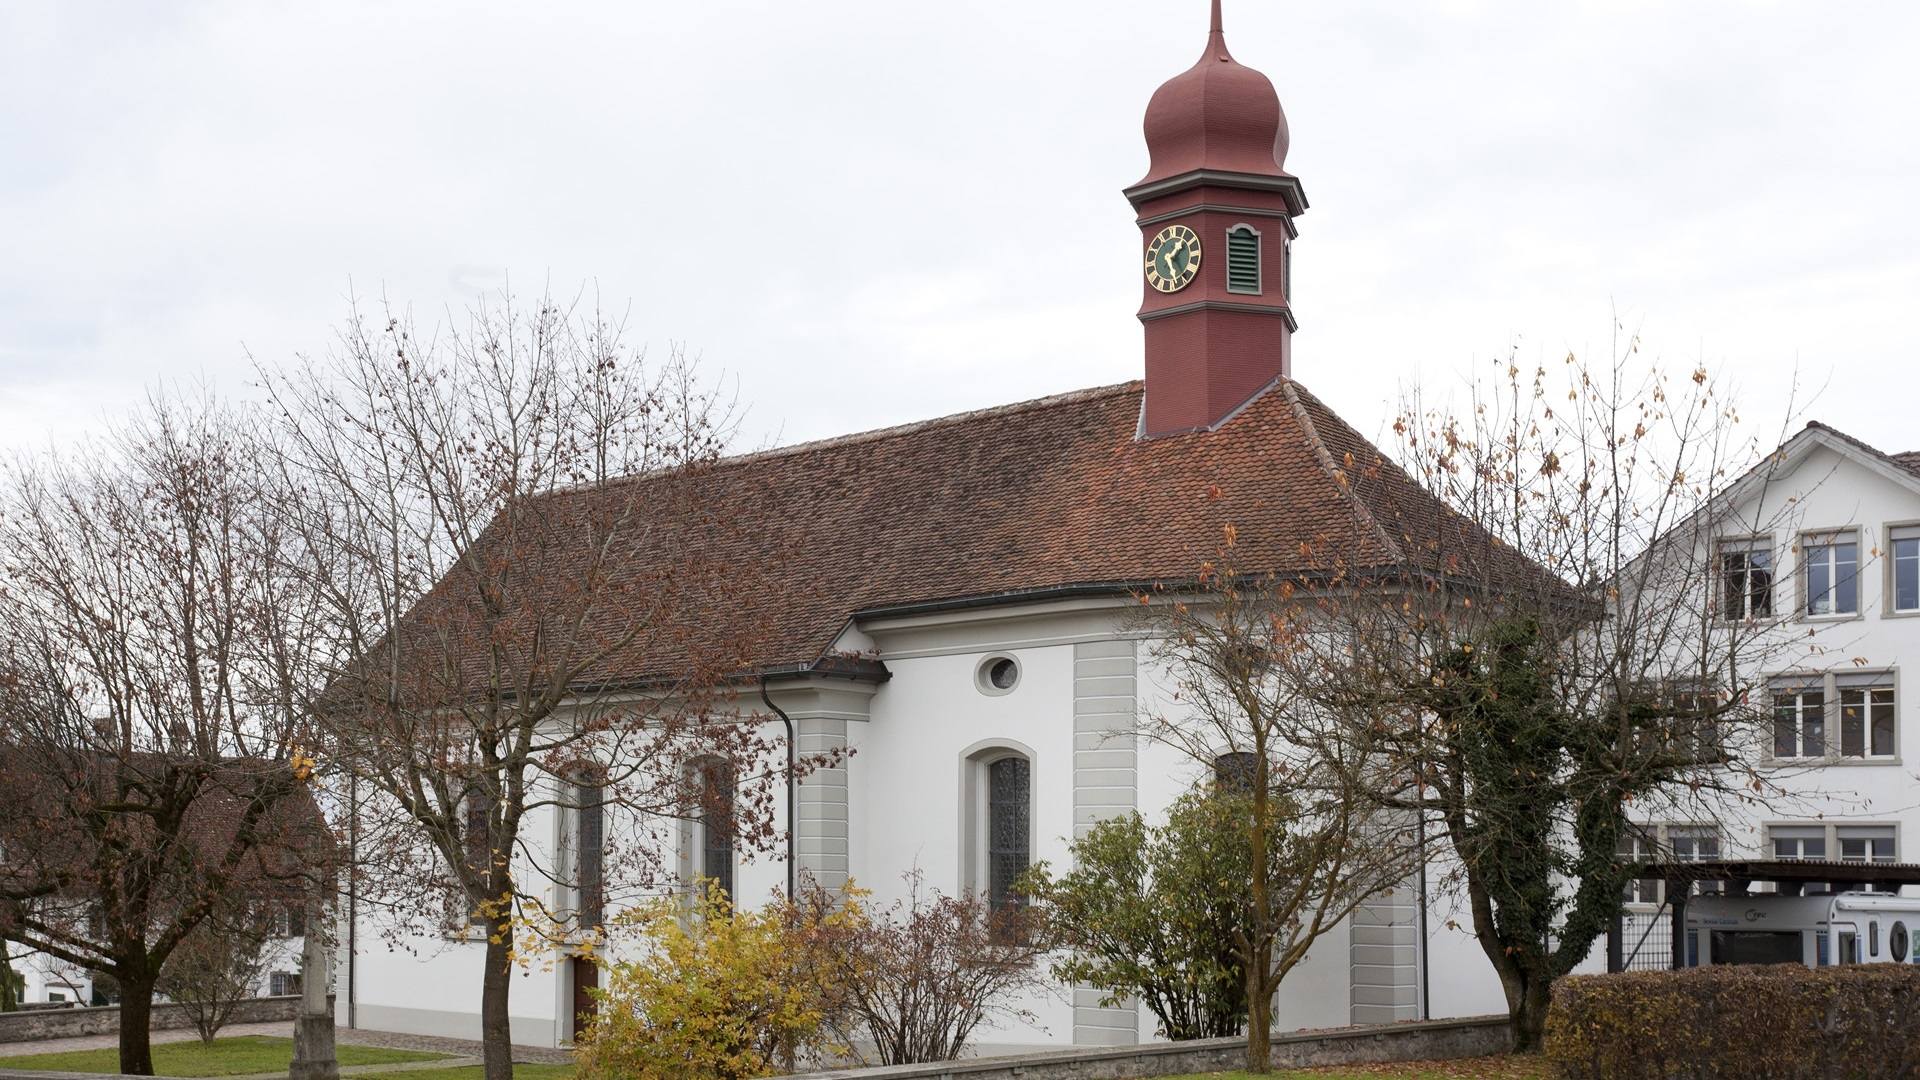 Bettwil, St. Josef | © Roger Wehrli